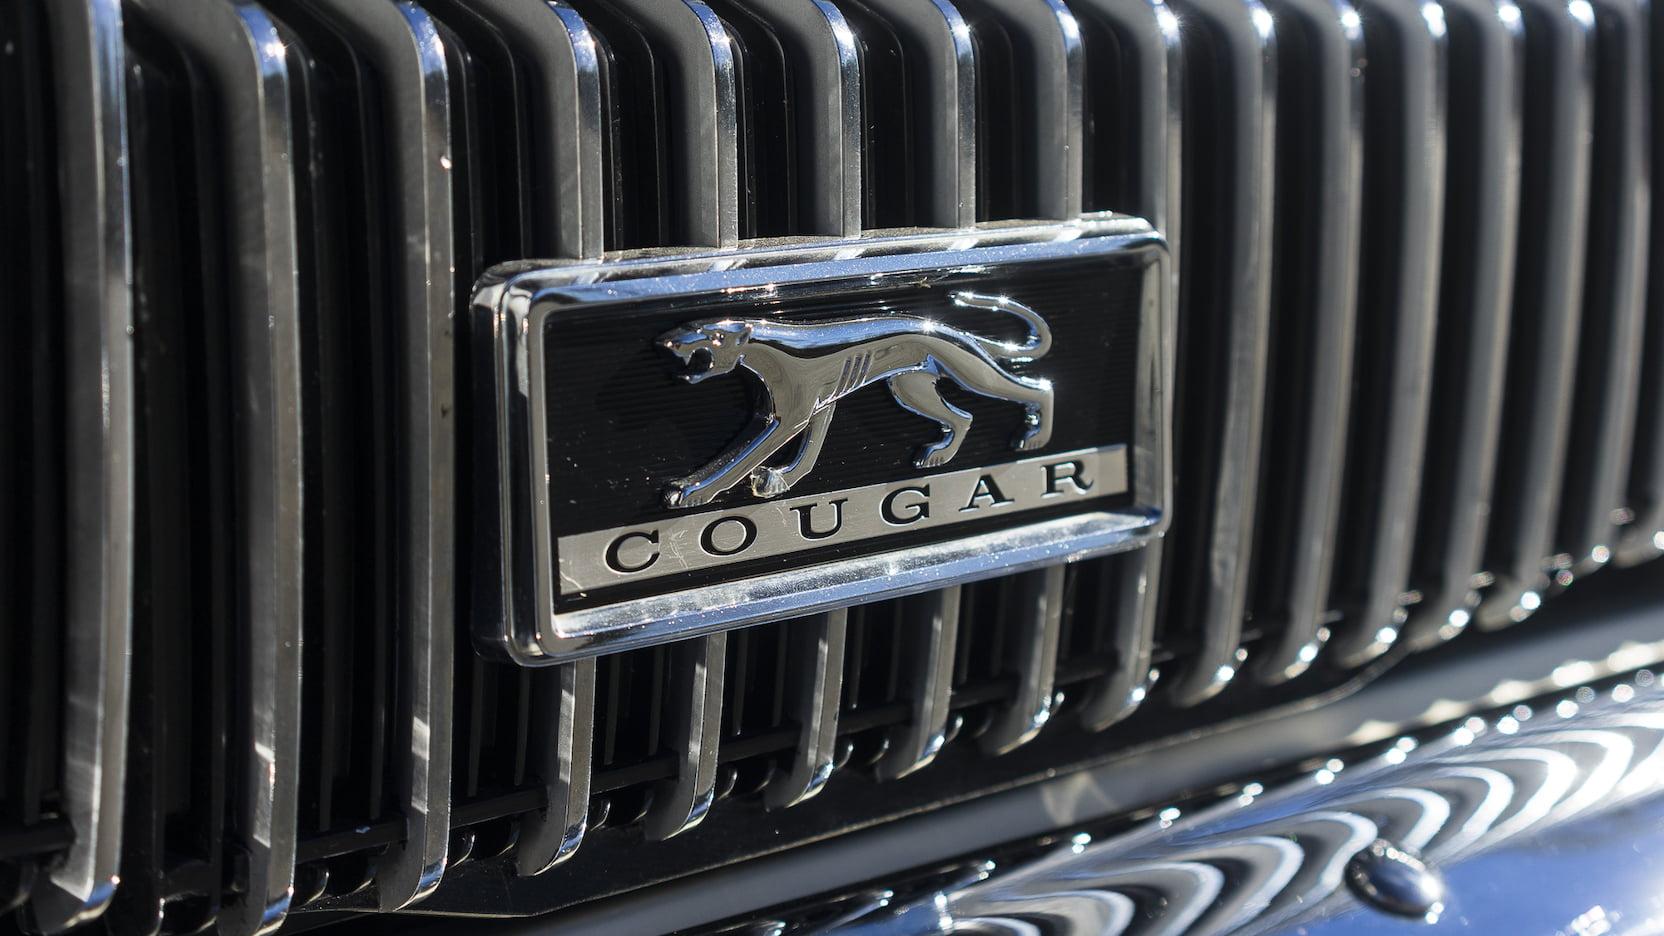 1967 Mercury Cougar grille